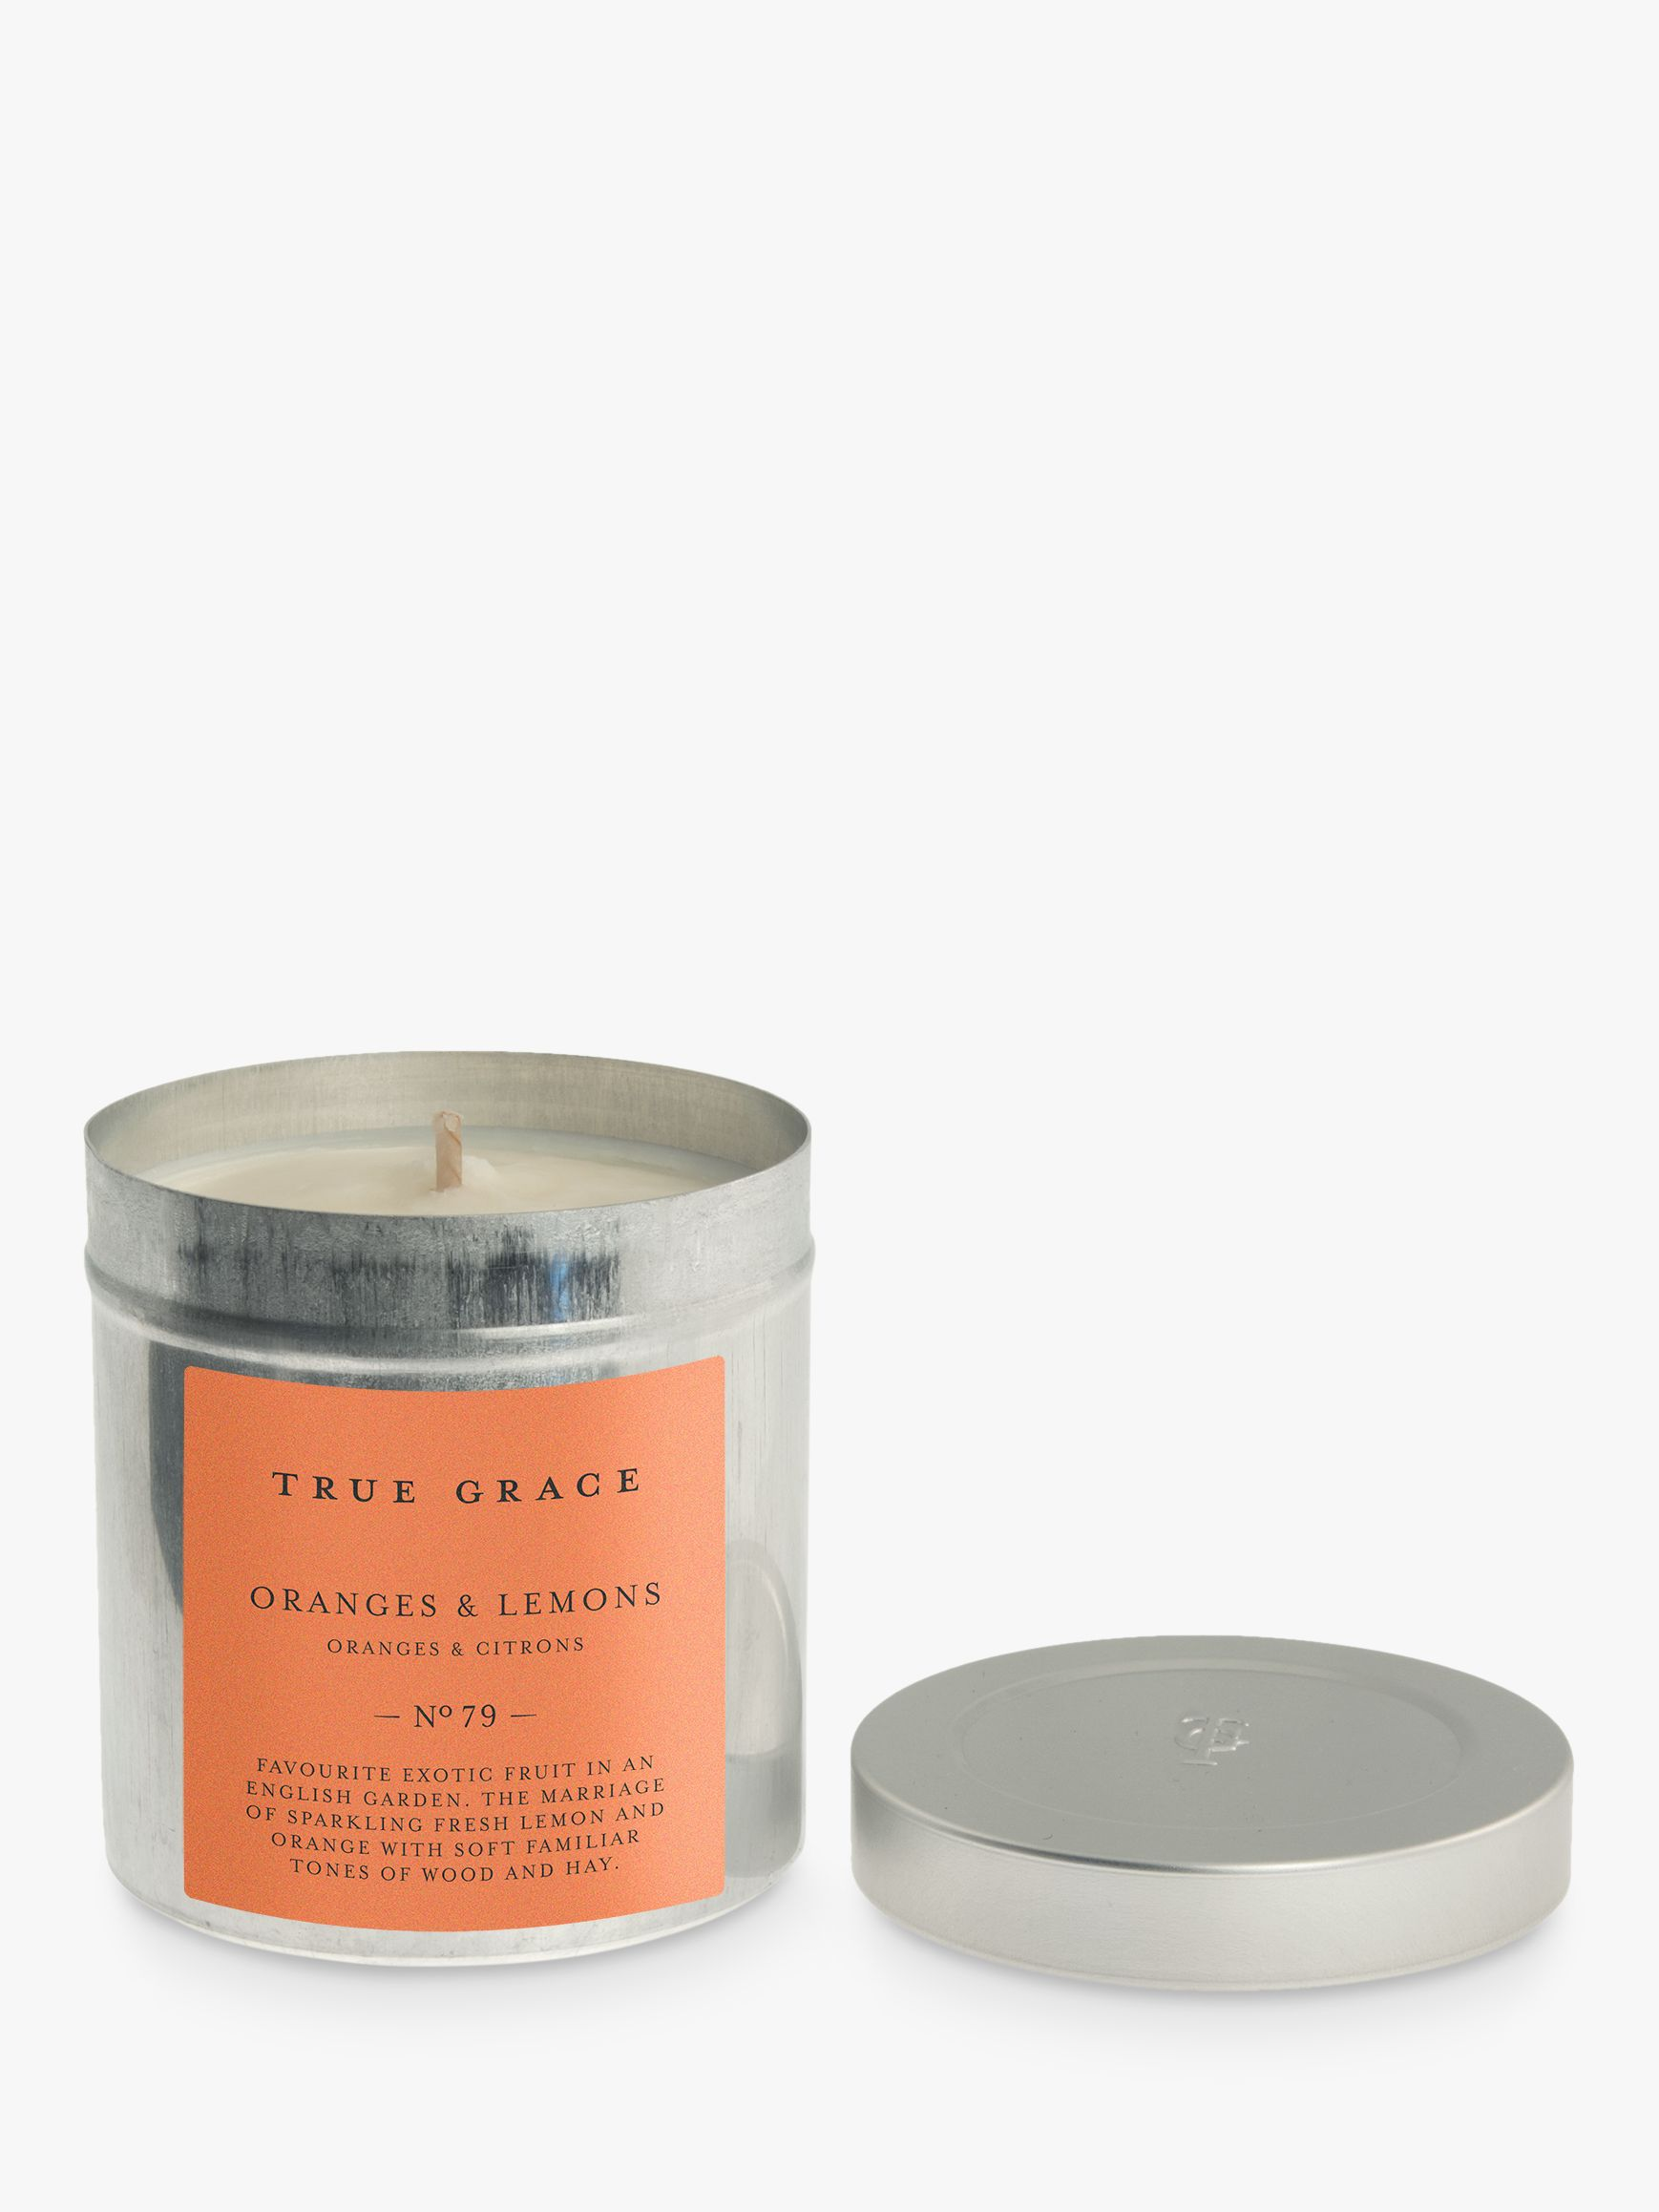 True Grace True Grace Oranges and Lemons Scented Candle Tin